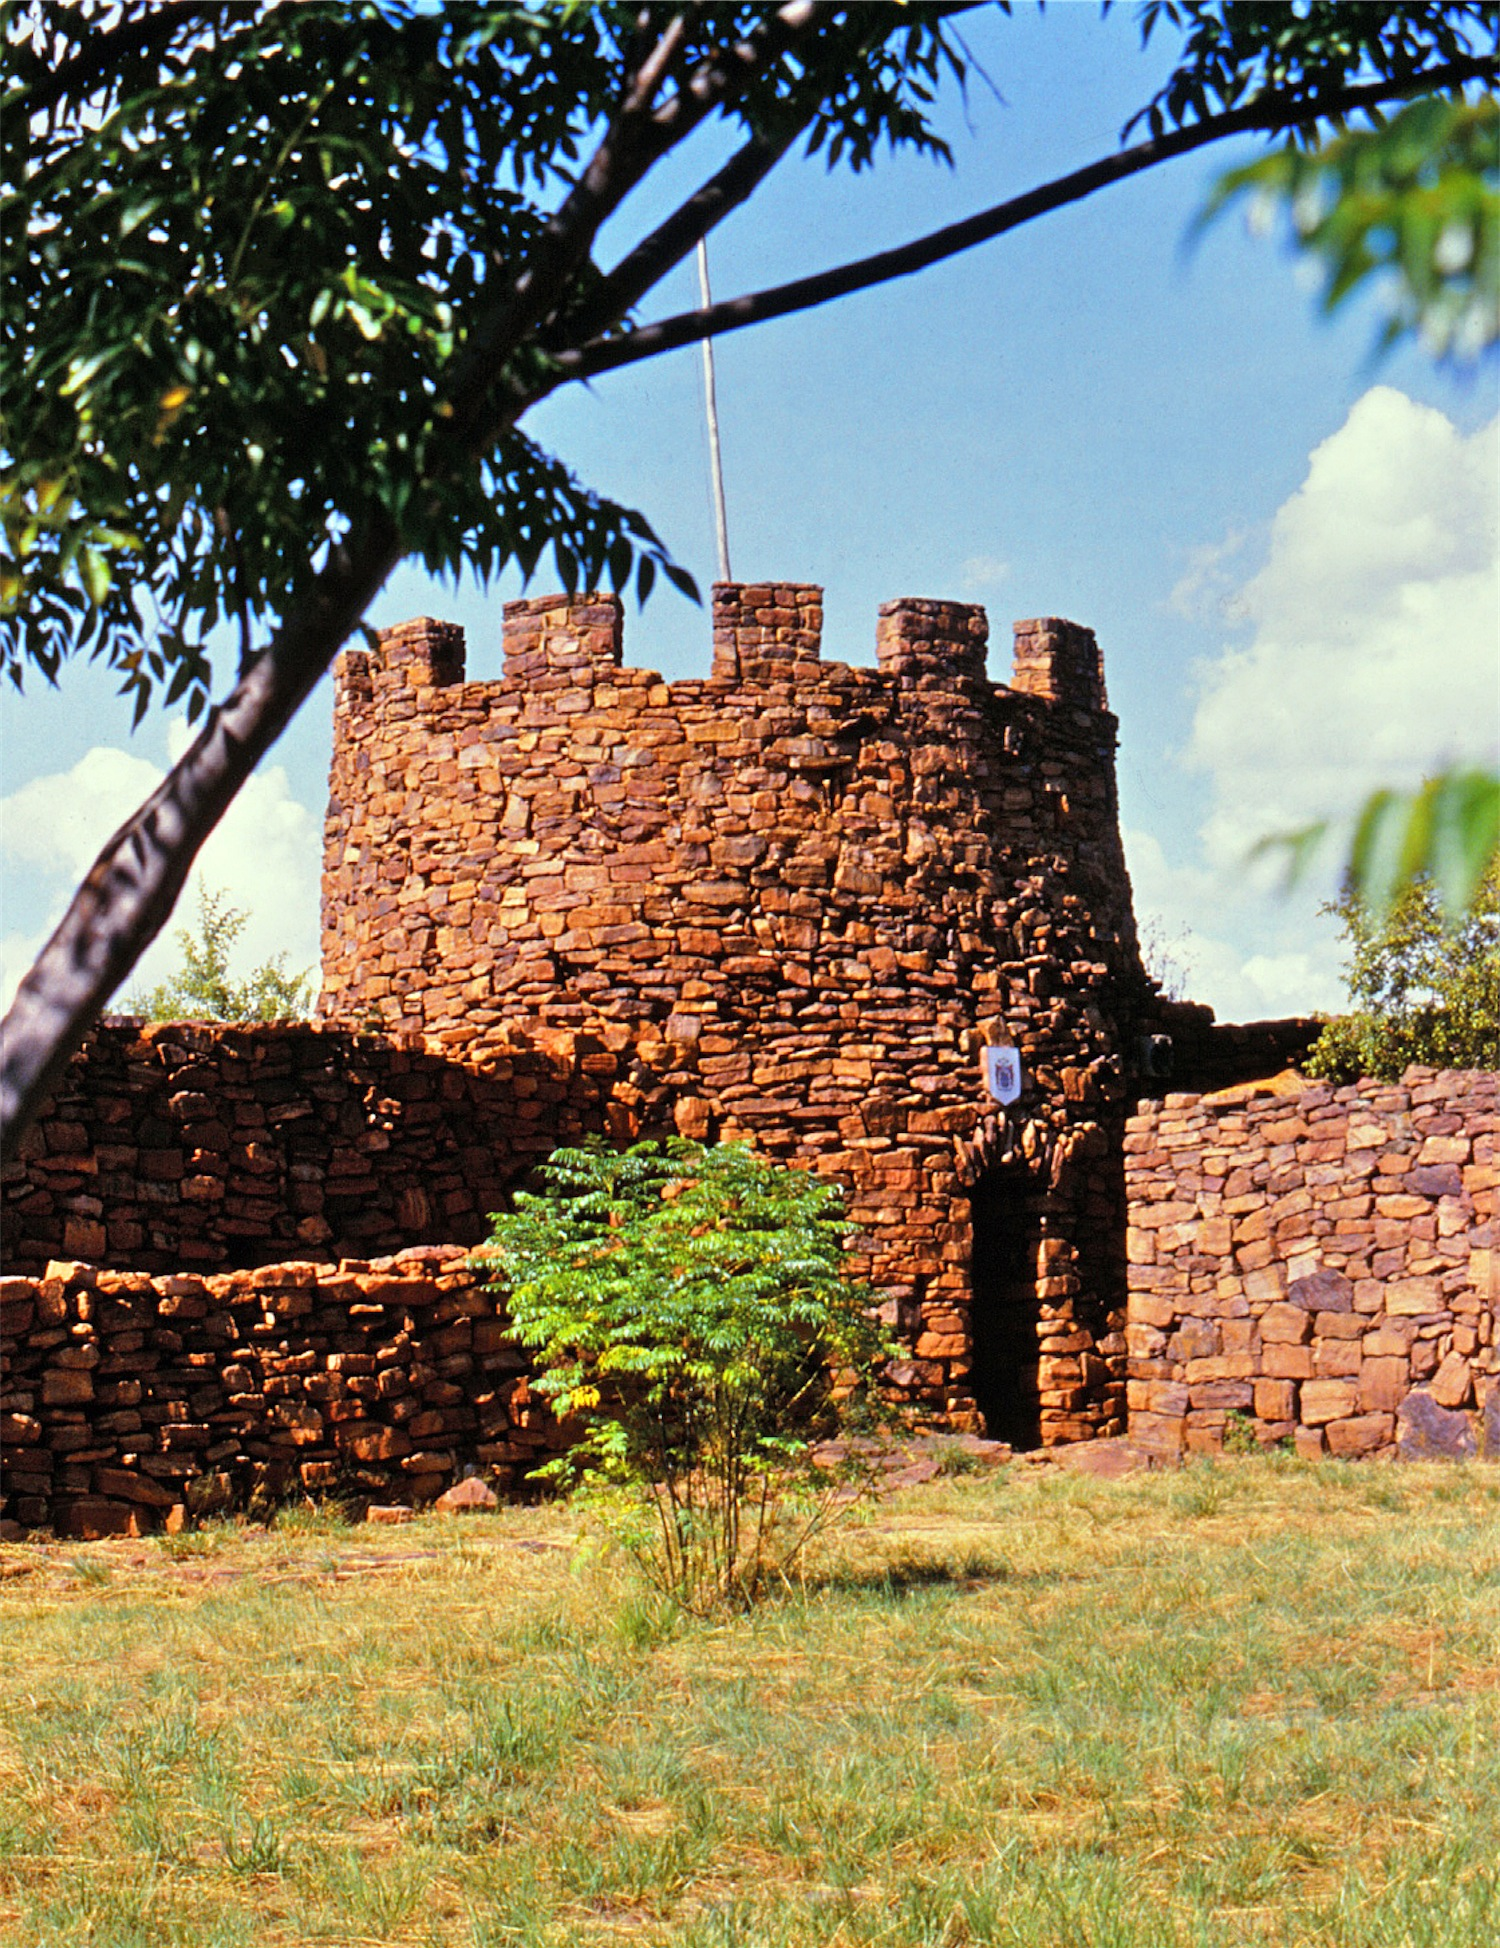 társkereső middelburg mpumalanga randevú makati